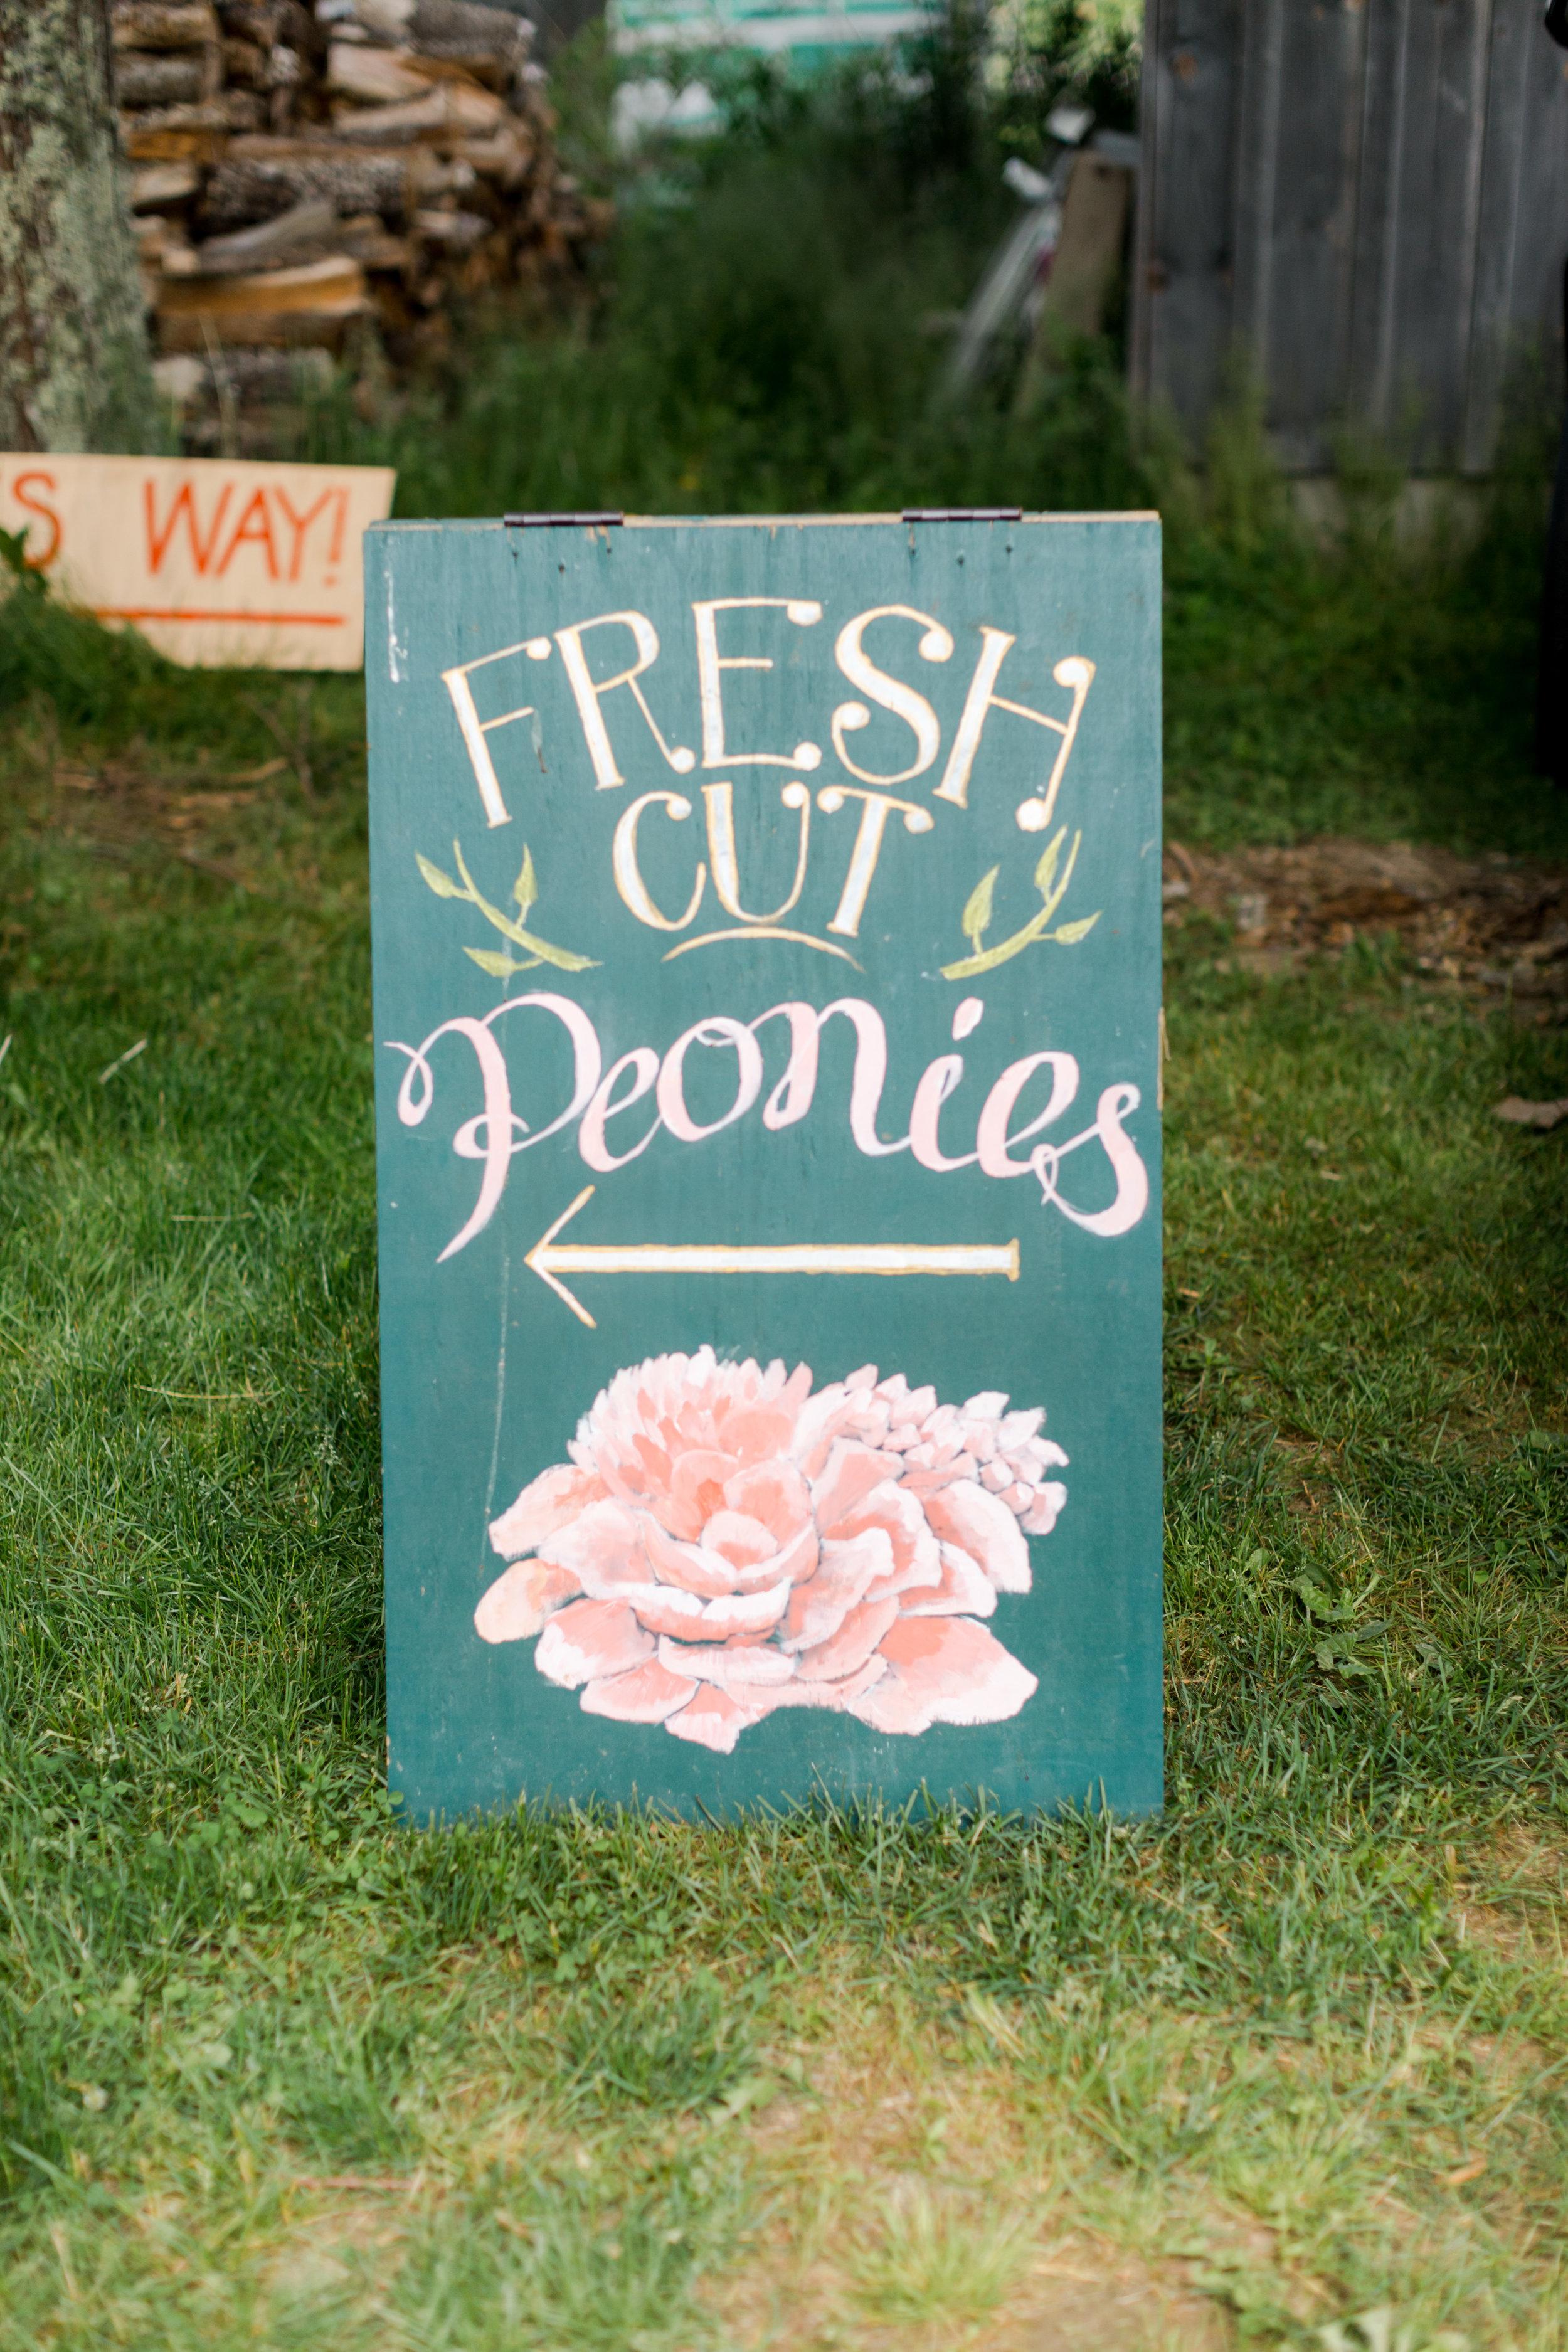 Peony Farm in Little Compton, Rhode Island from Abby Capalbo | Photography: Erin McGinn